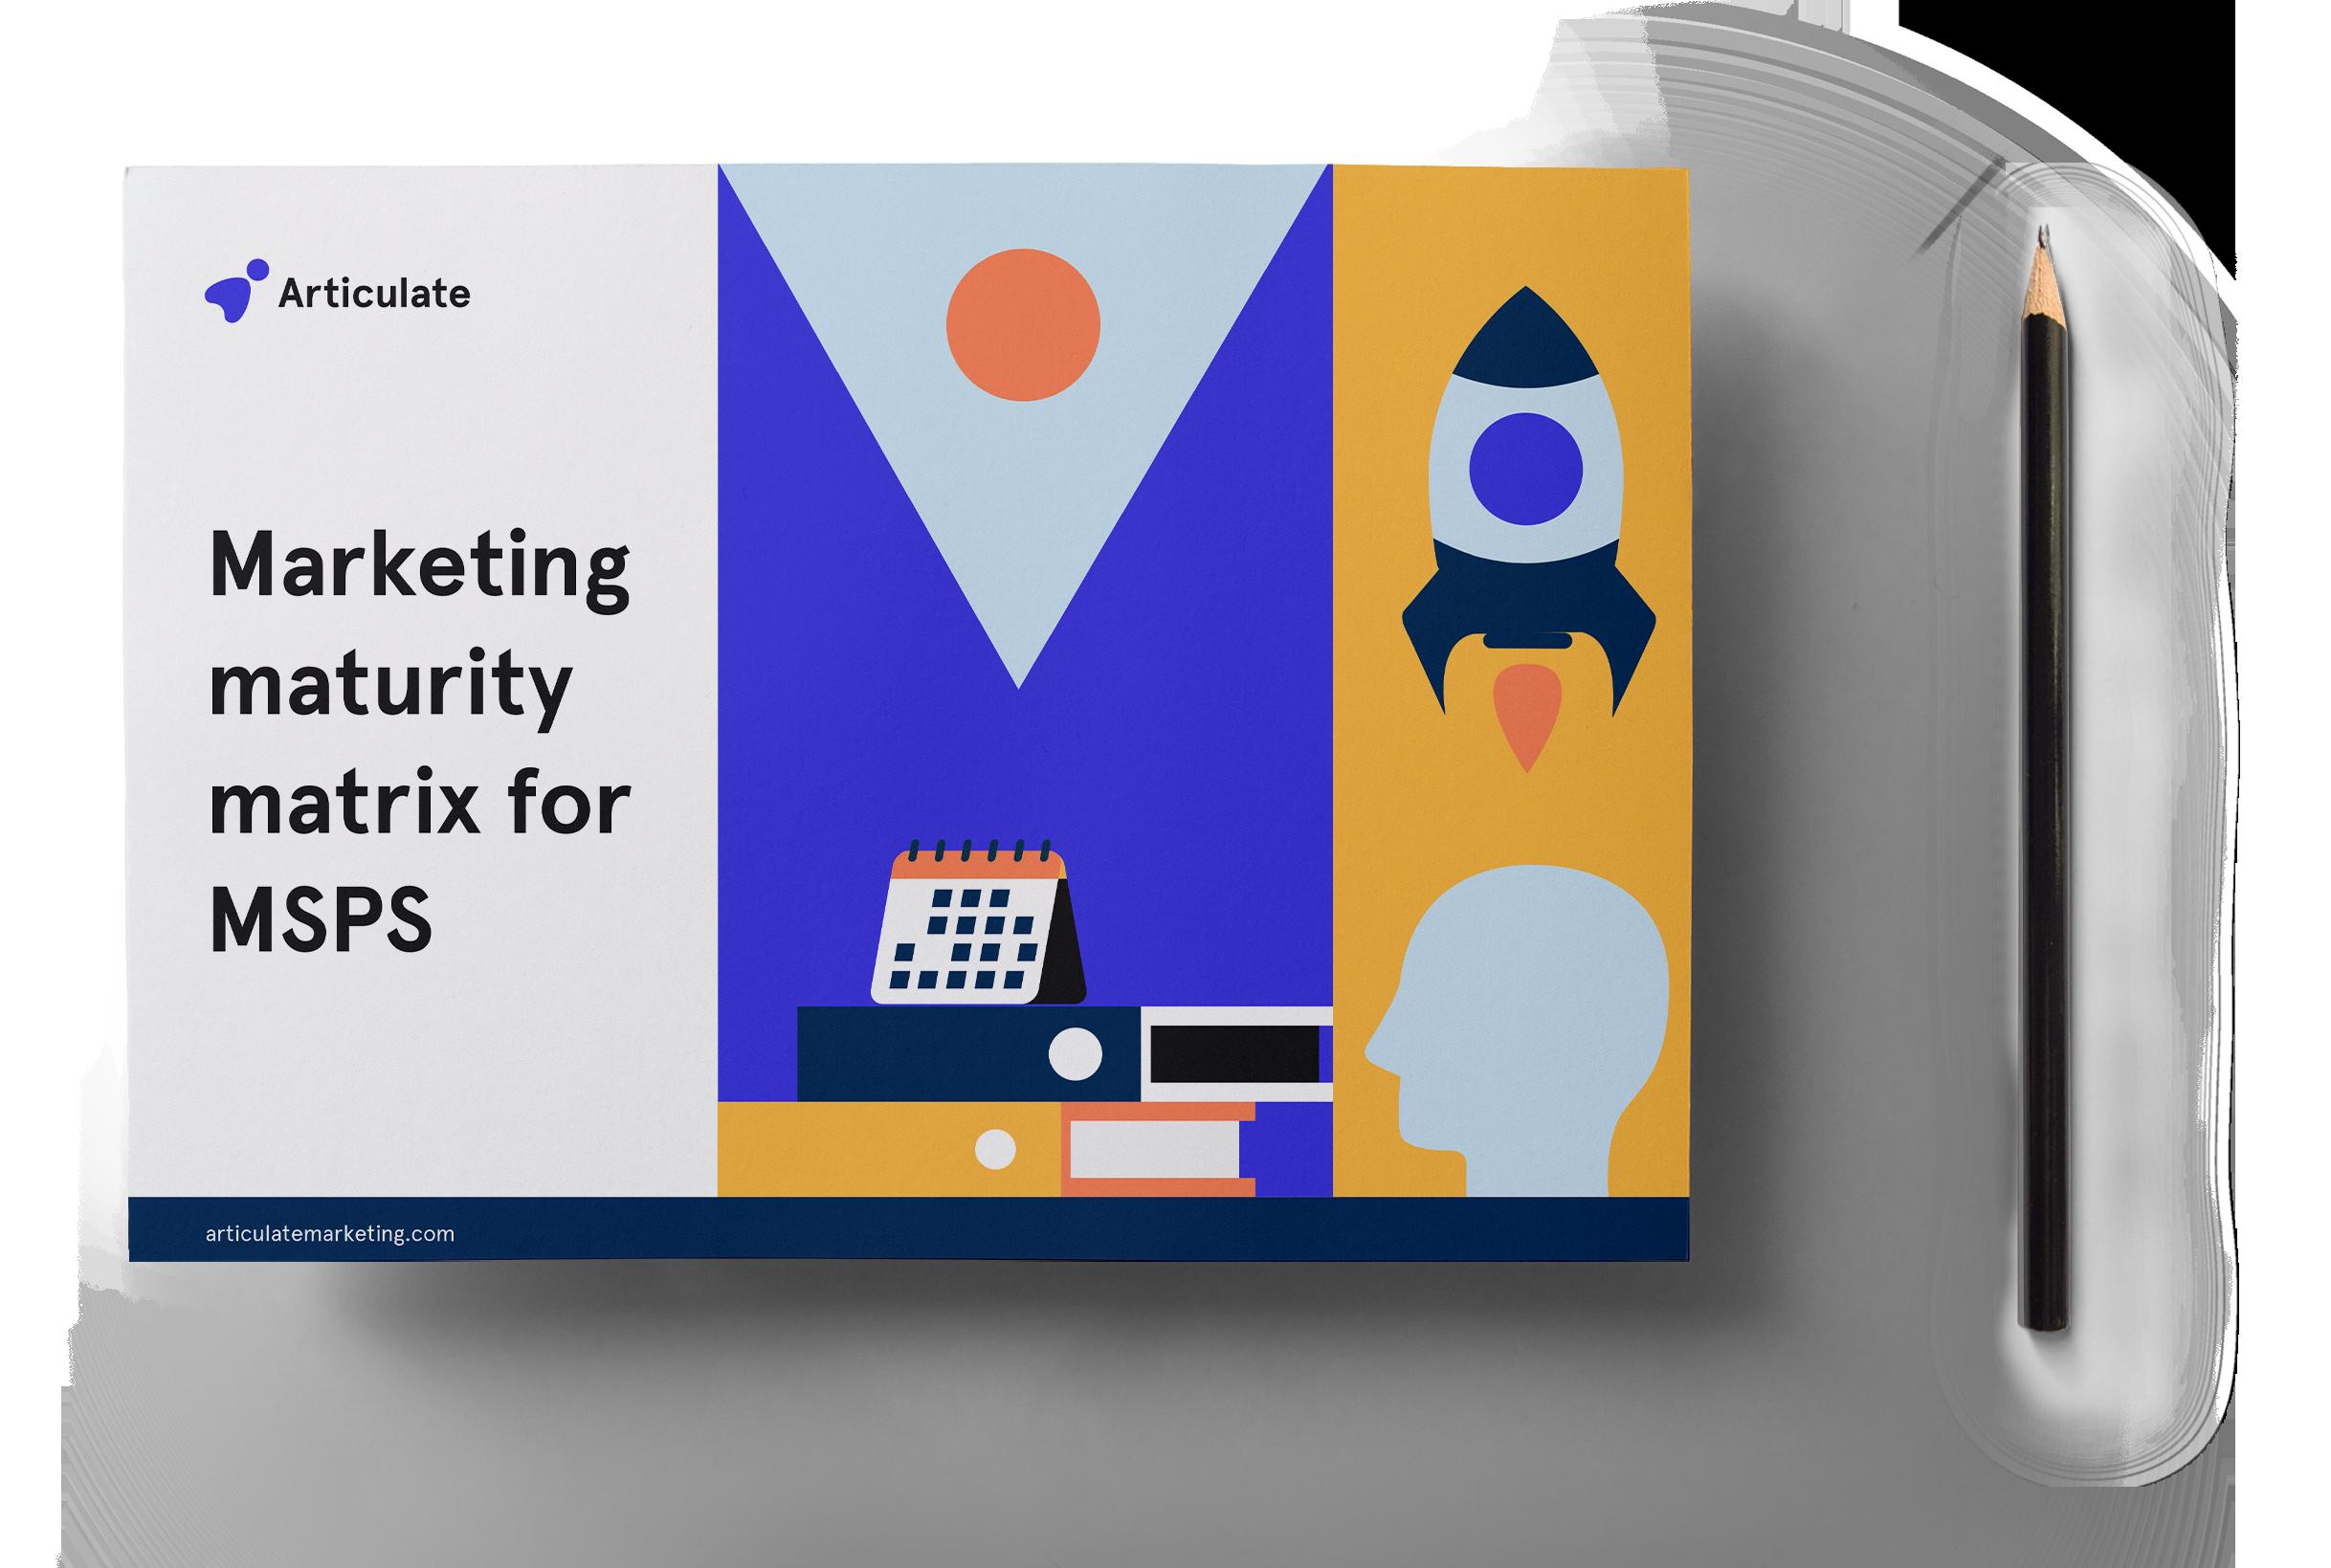 Marketing maturity matrix